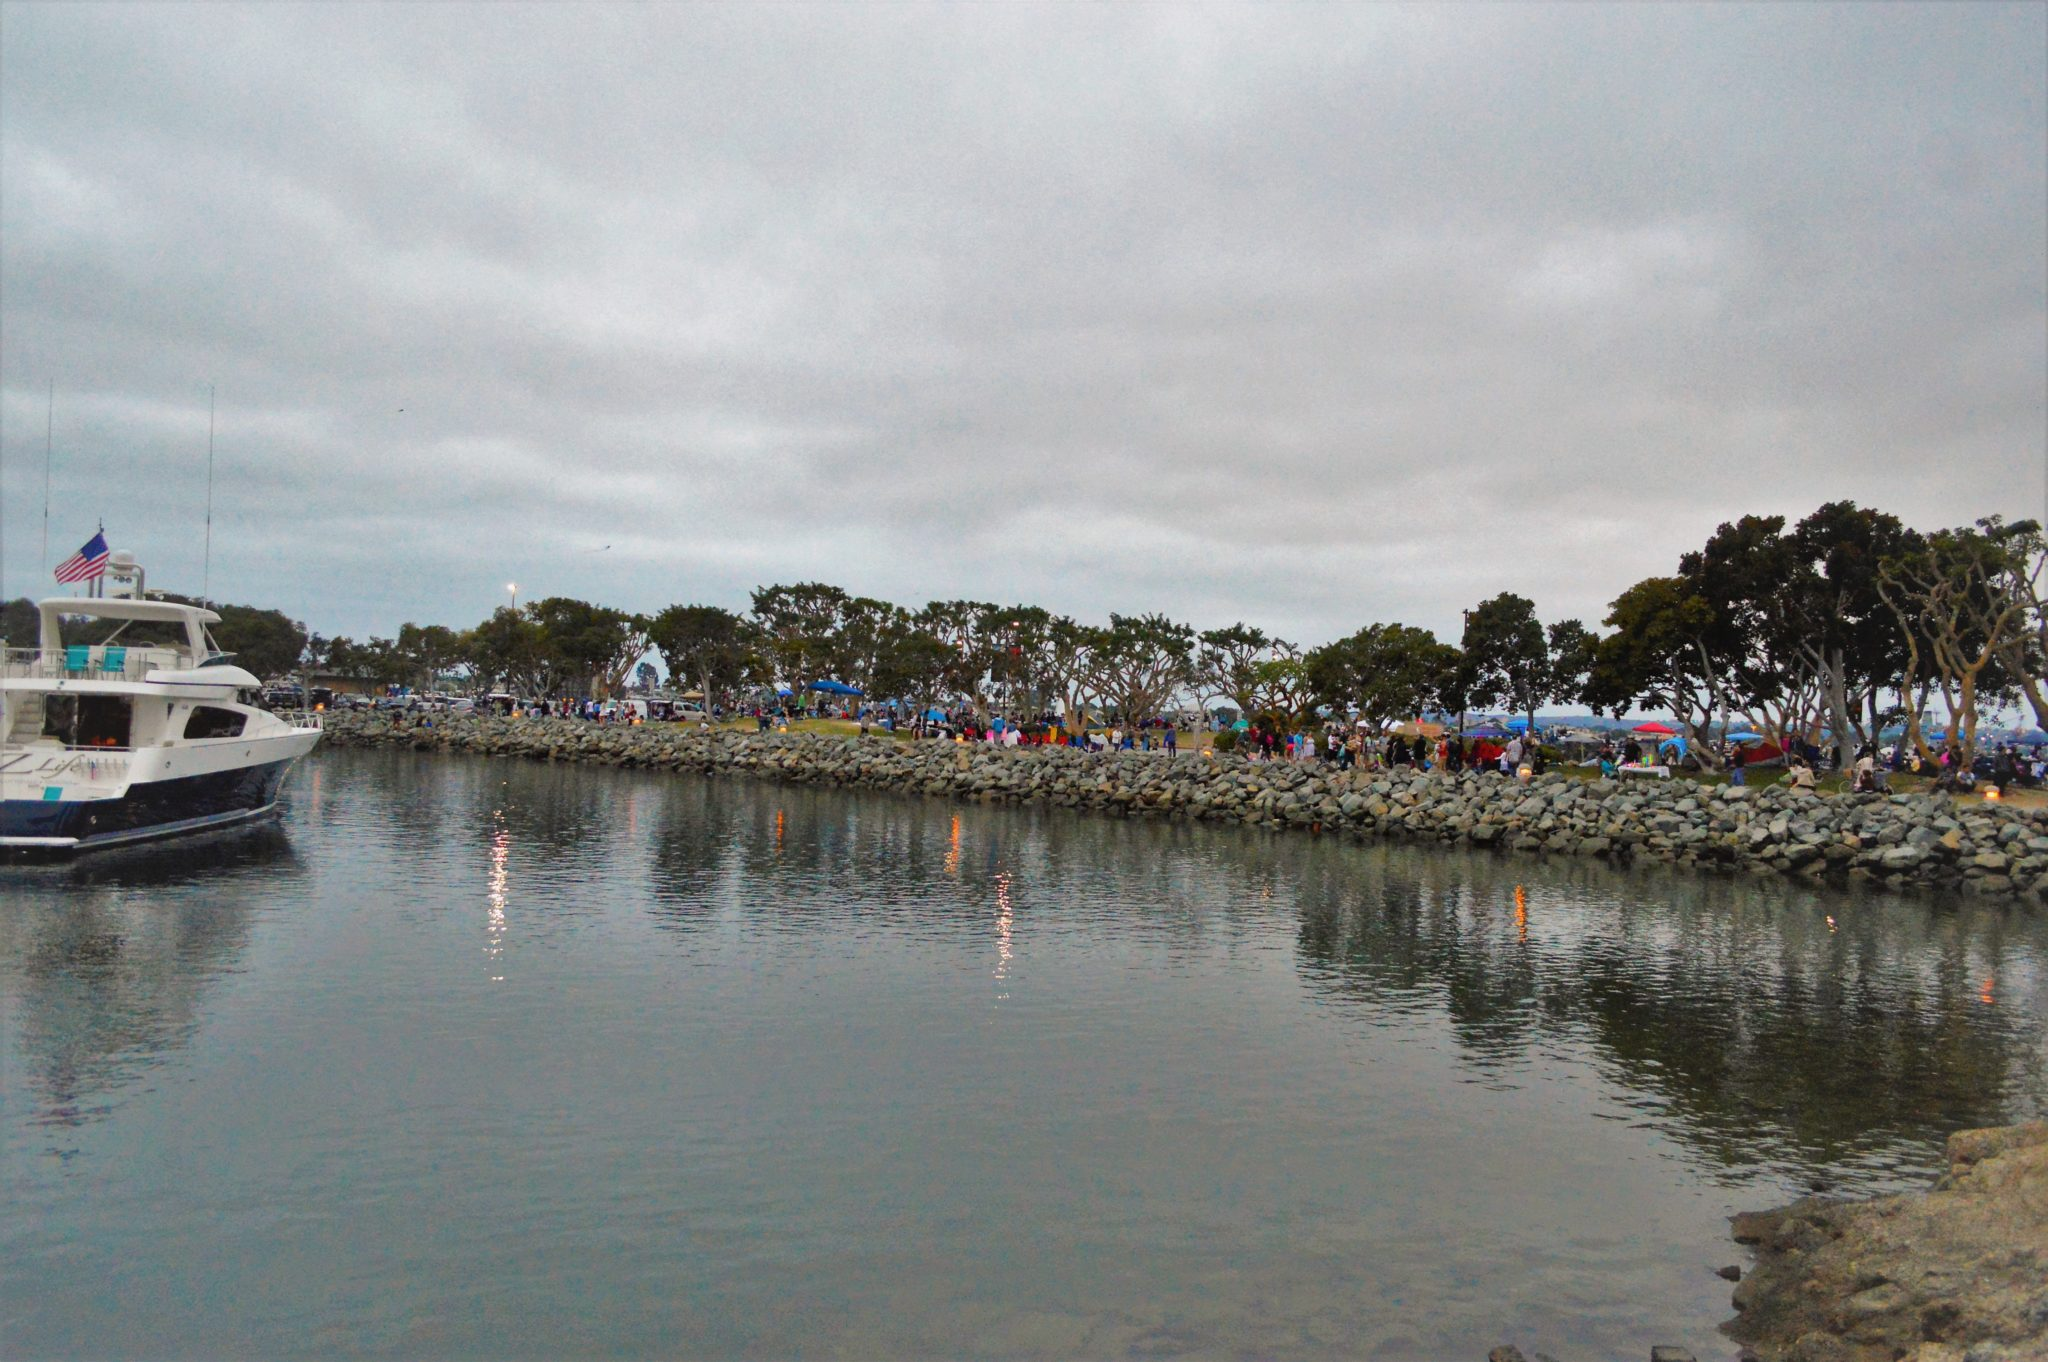 San diego's big bay boom, california